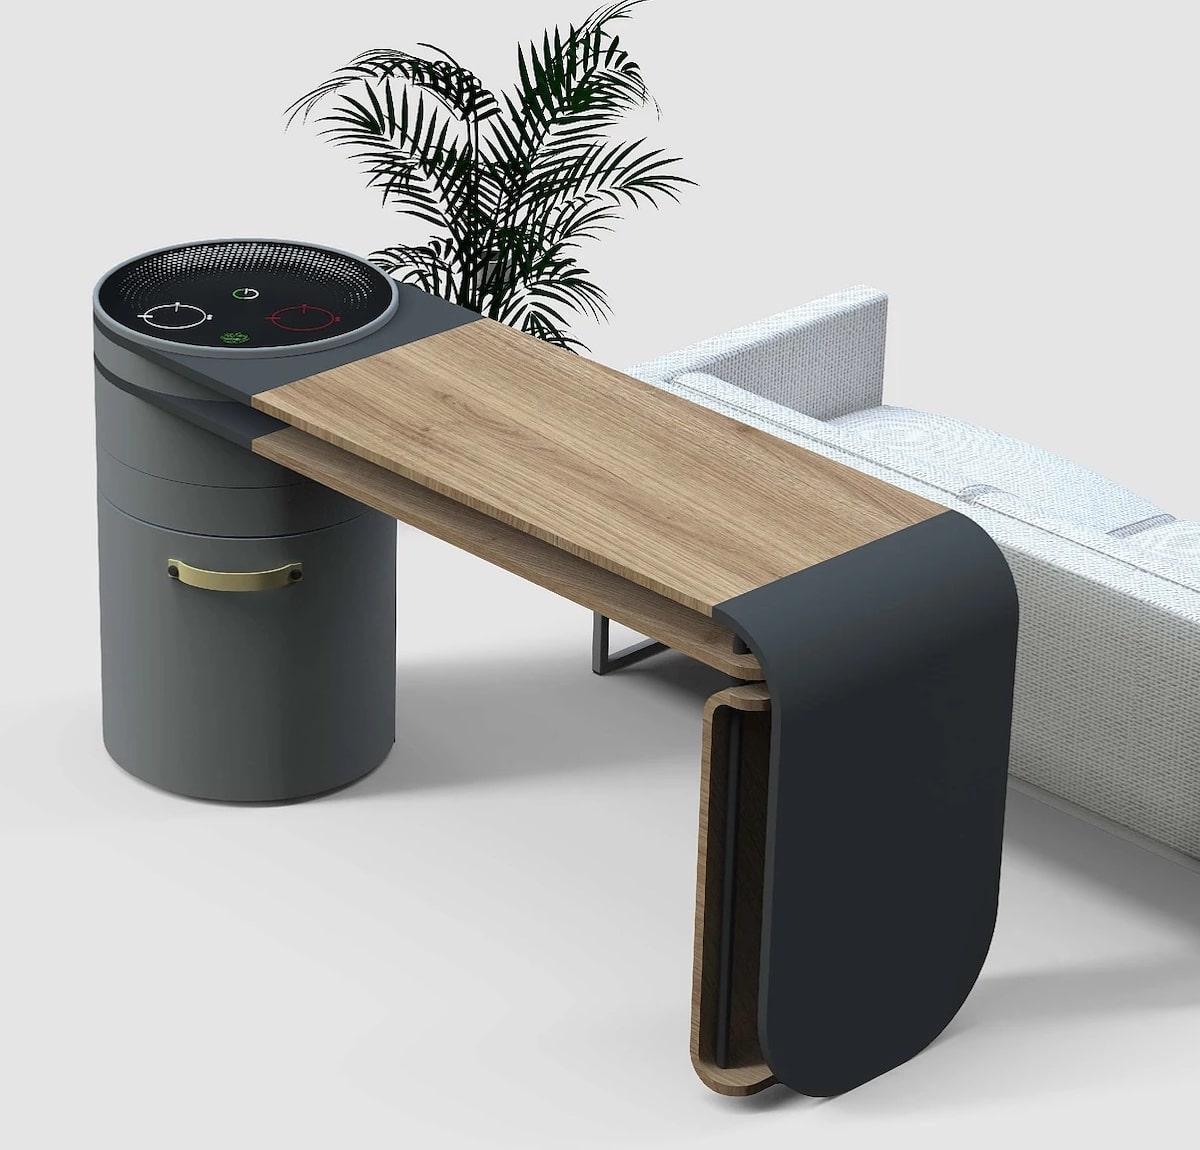 Clock table design Yep